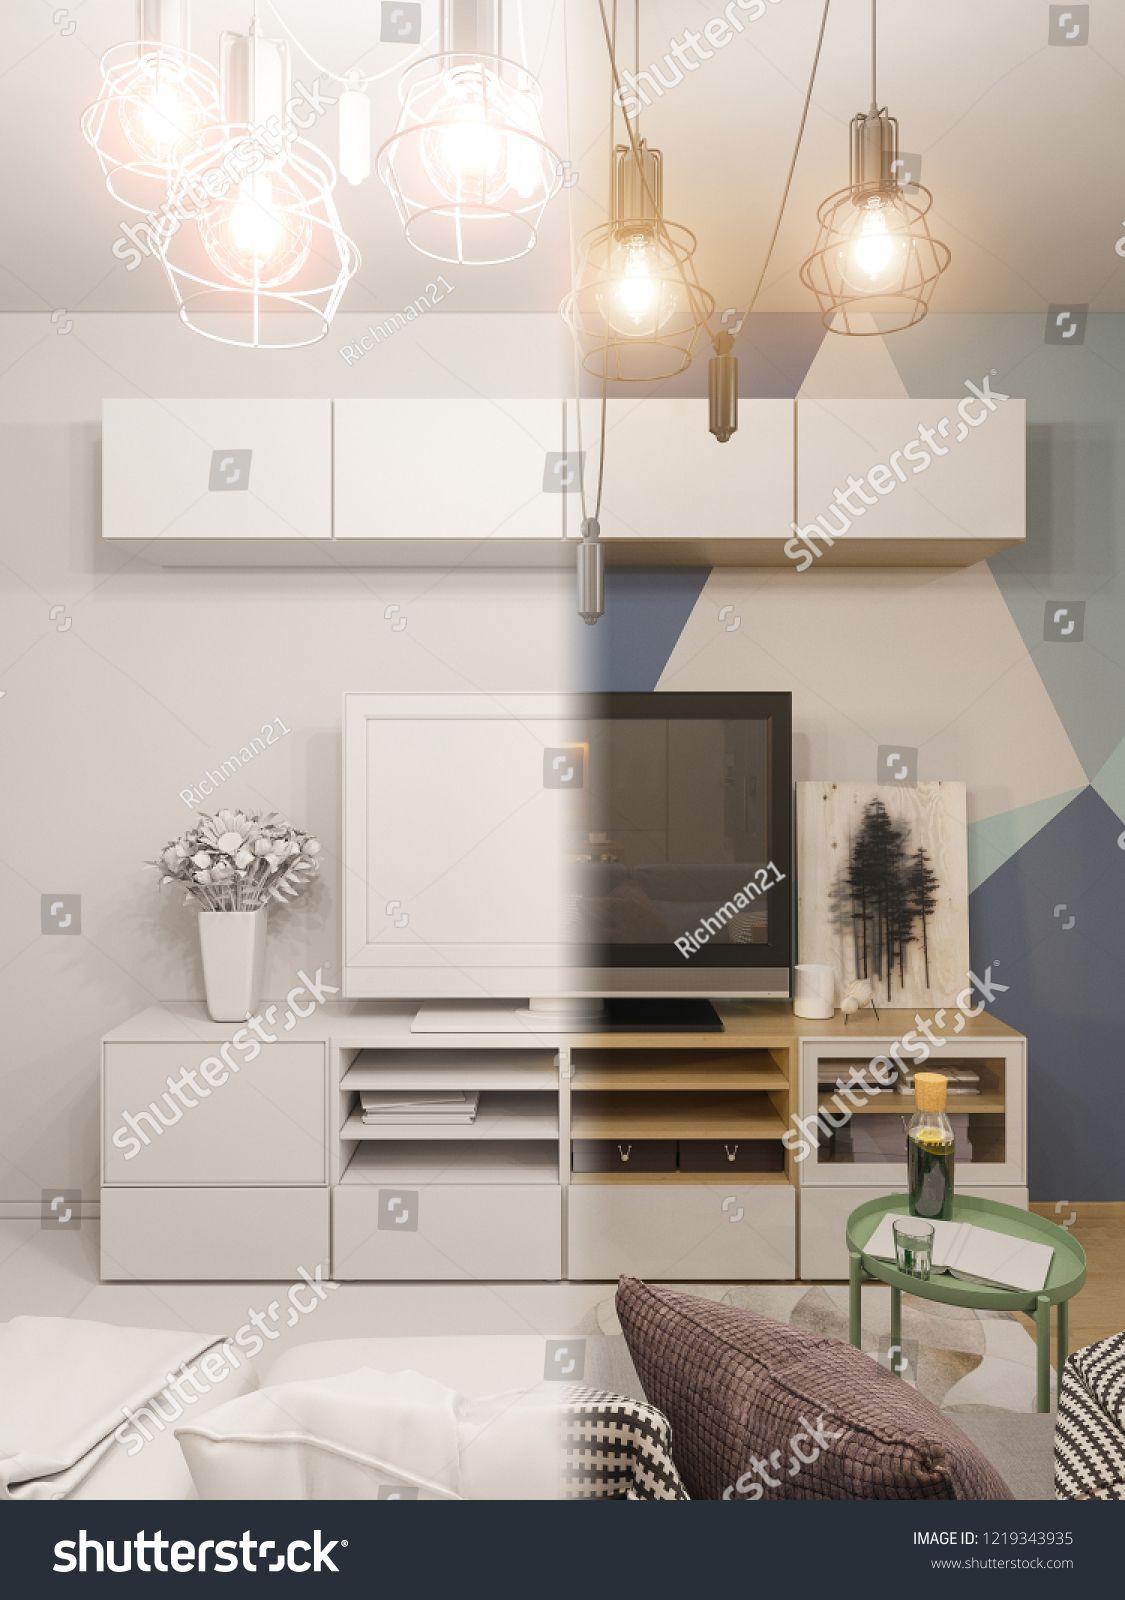 3d Room Interior Design: 3d Illustration Living Room Interior Design. Modern Studio